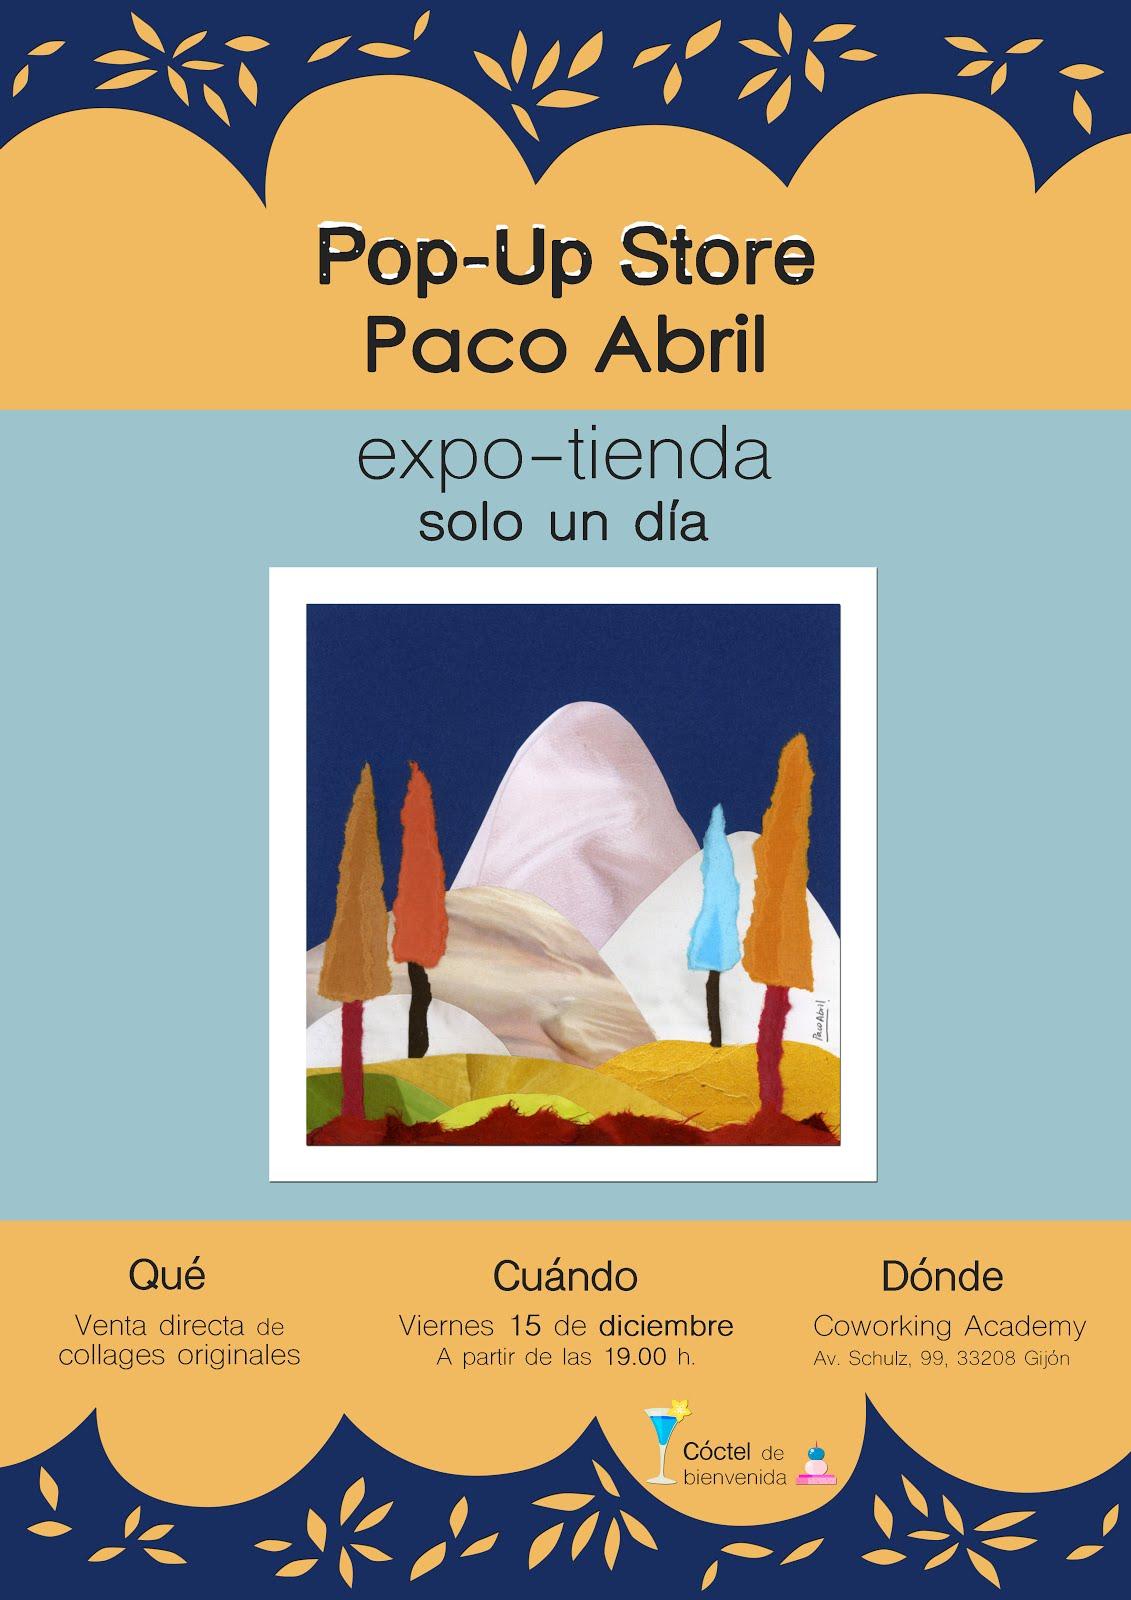 POP-UP Store. Expo-tienda